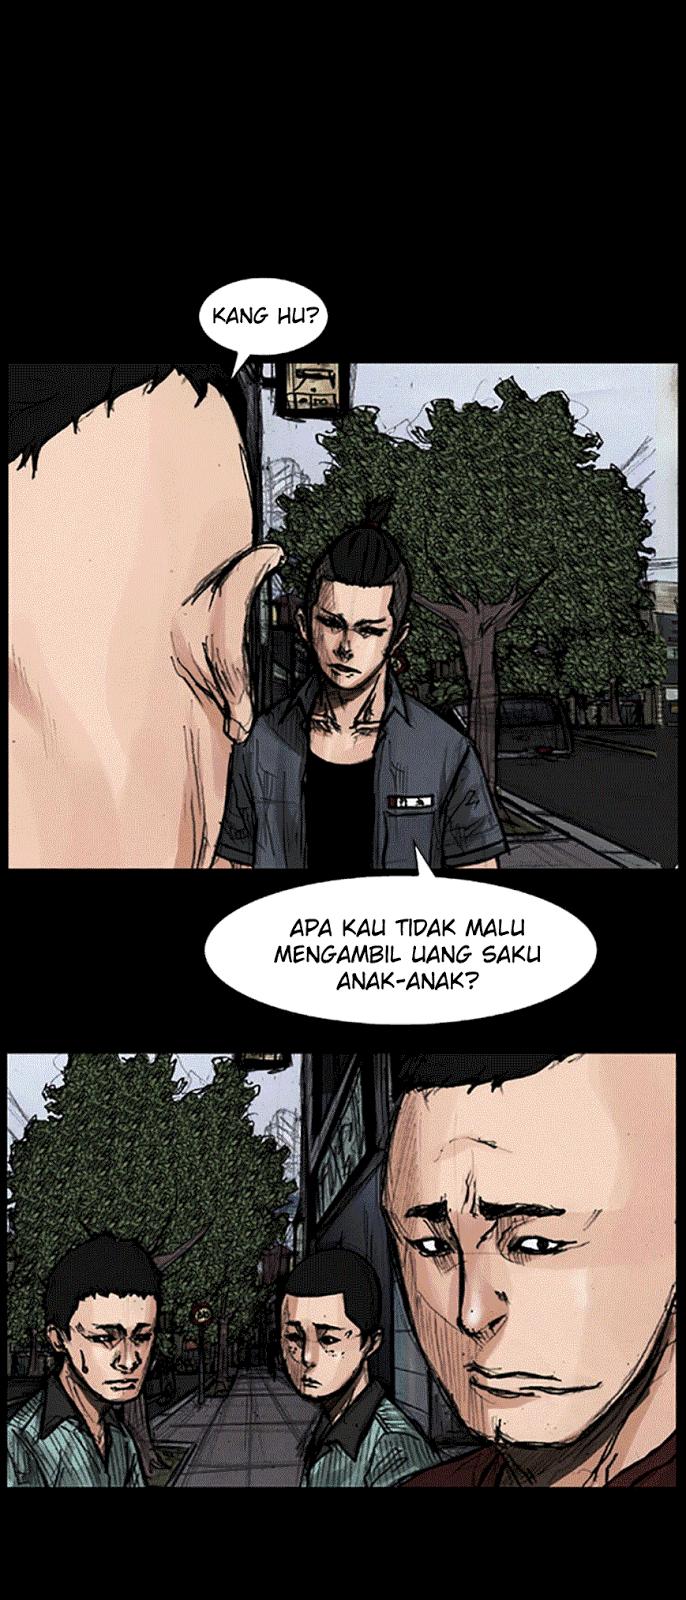 Komik dokgo 041 - chapter 41 42 Indonesia dokgo 041 - chapter 41 Terbaru 2|Baca Manga Komik Indonesia